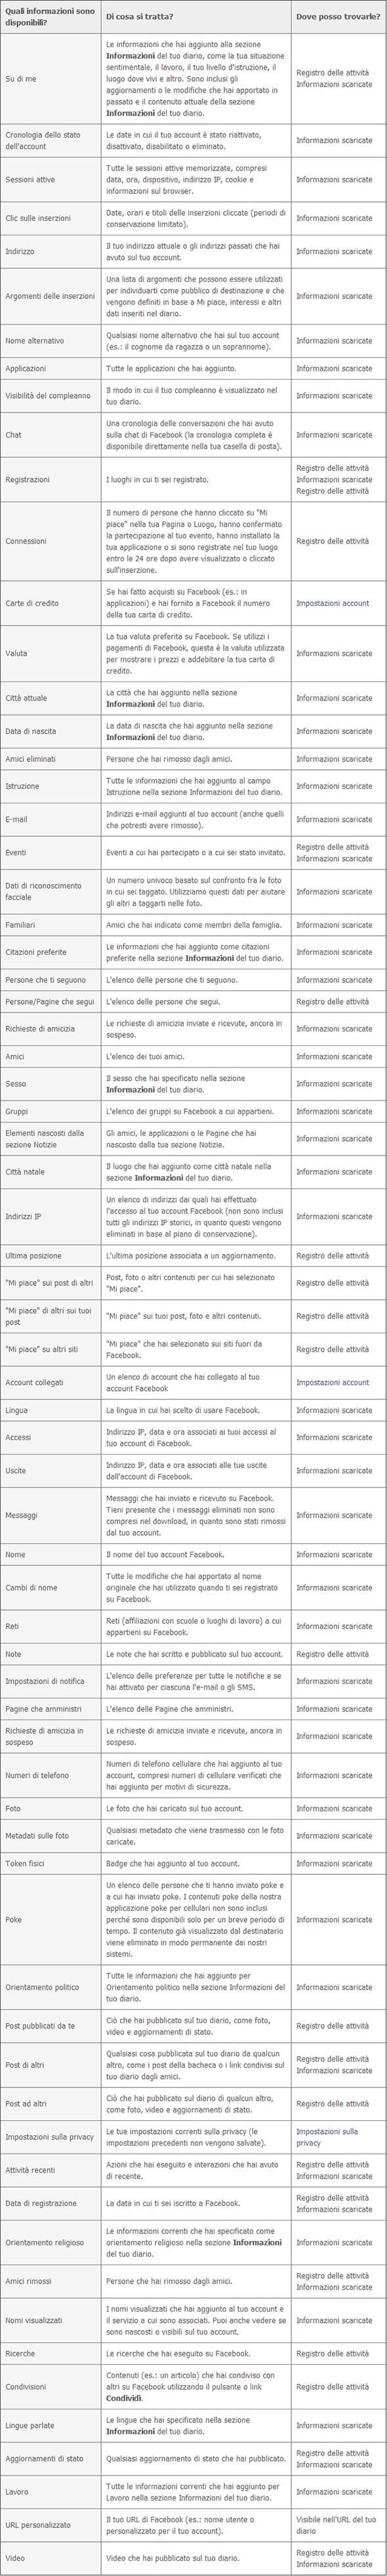 tabella dati facebook